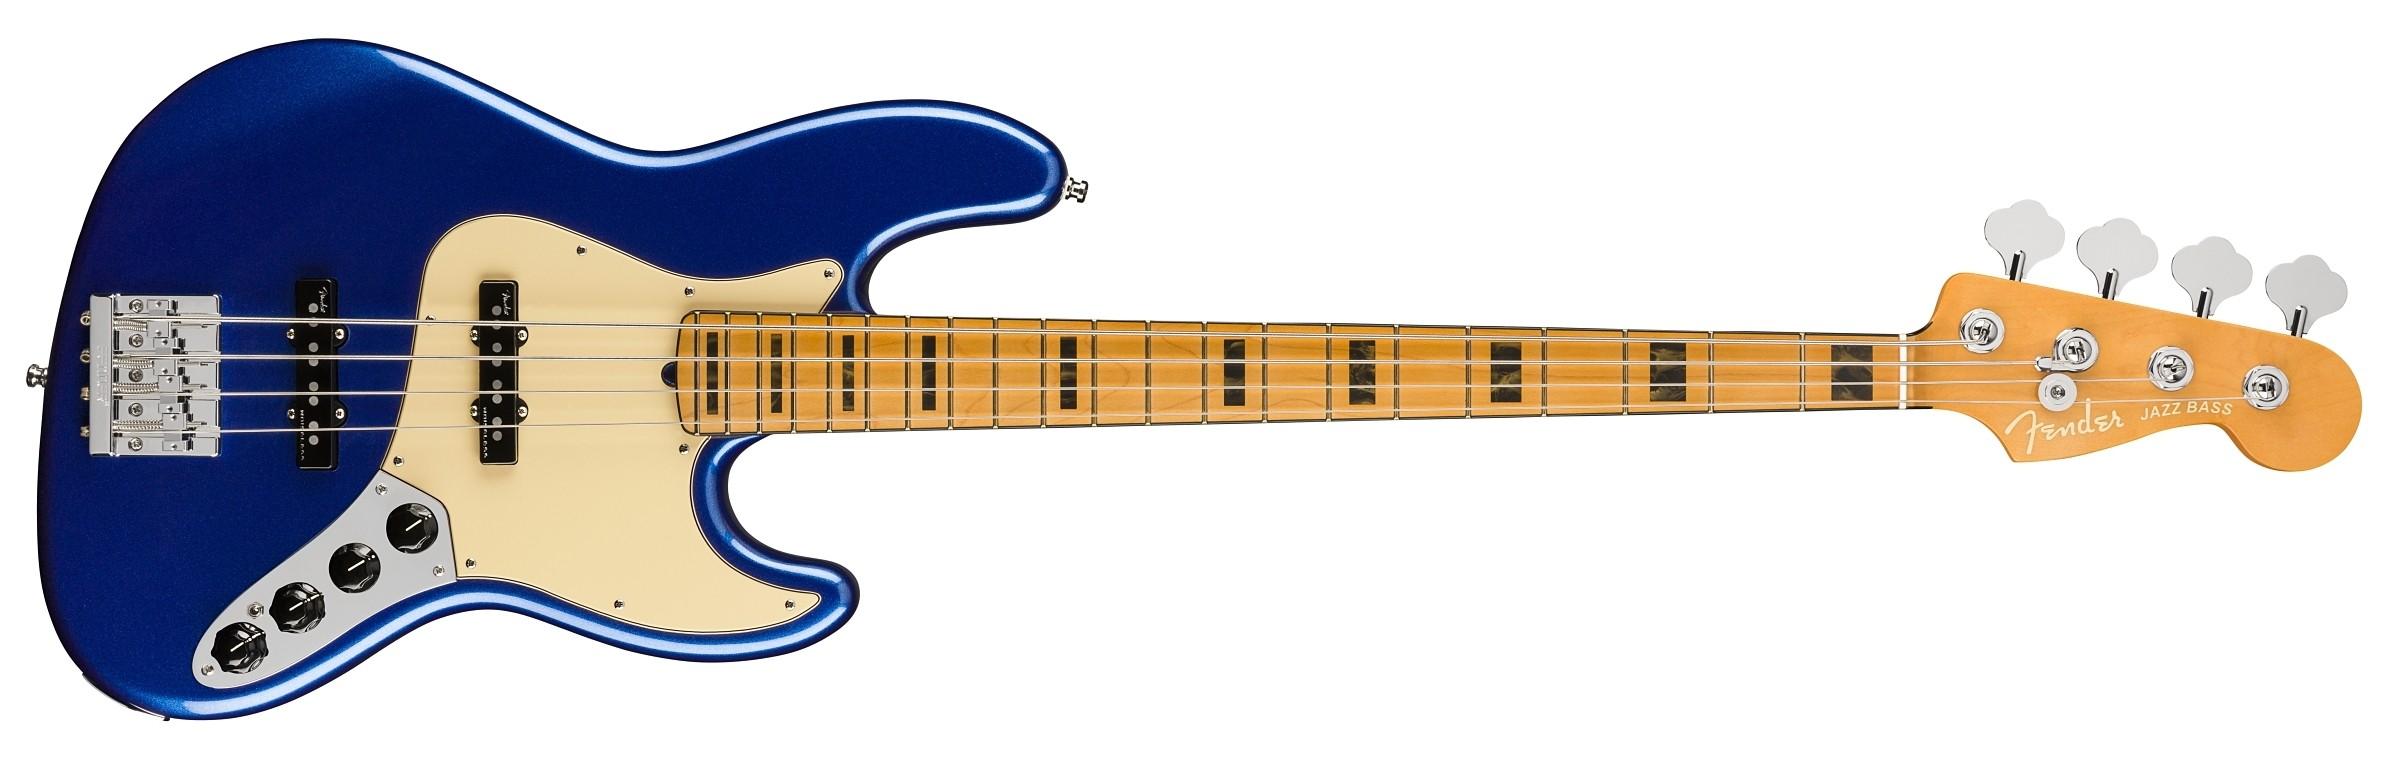 Fender American Ultra Jazz Bass - Cobra Blue - Maple